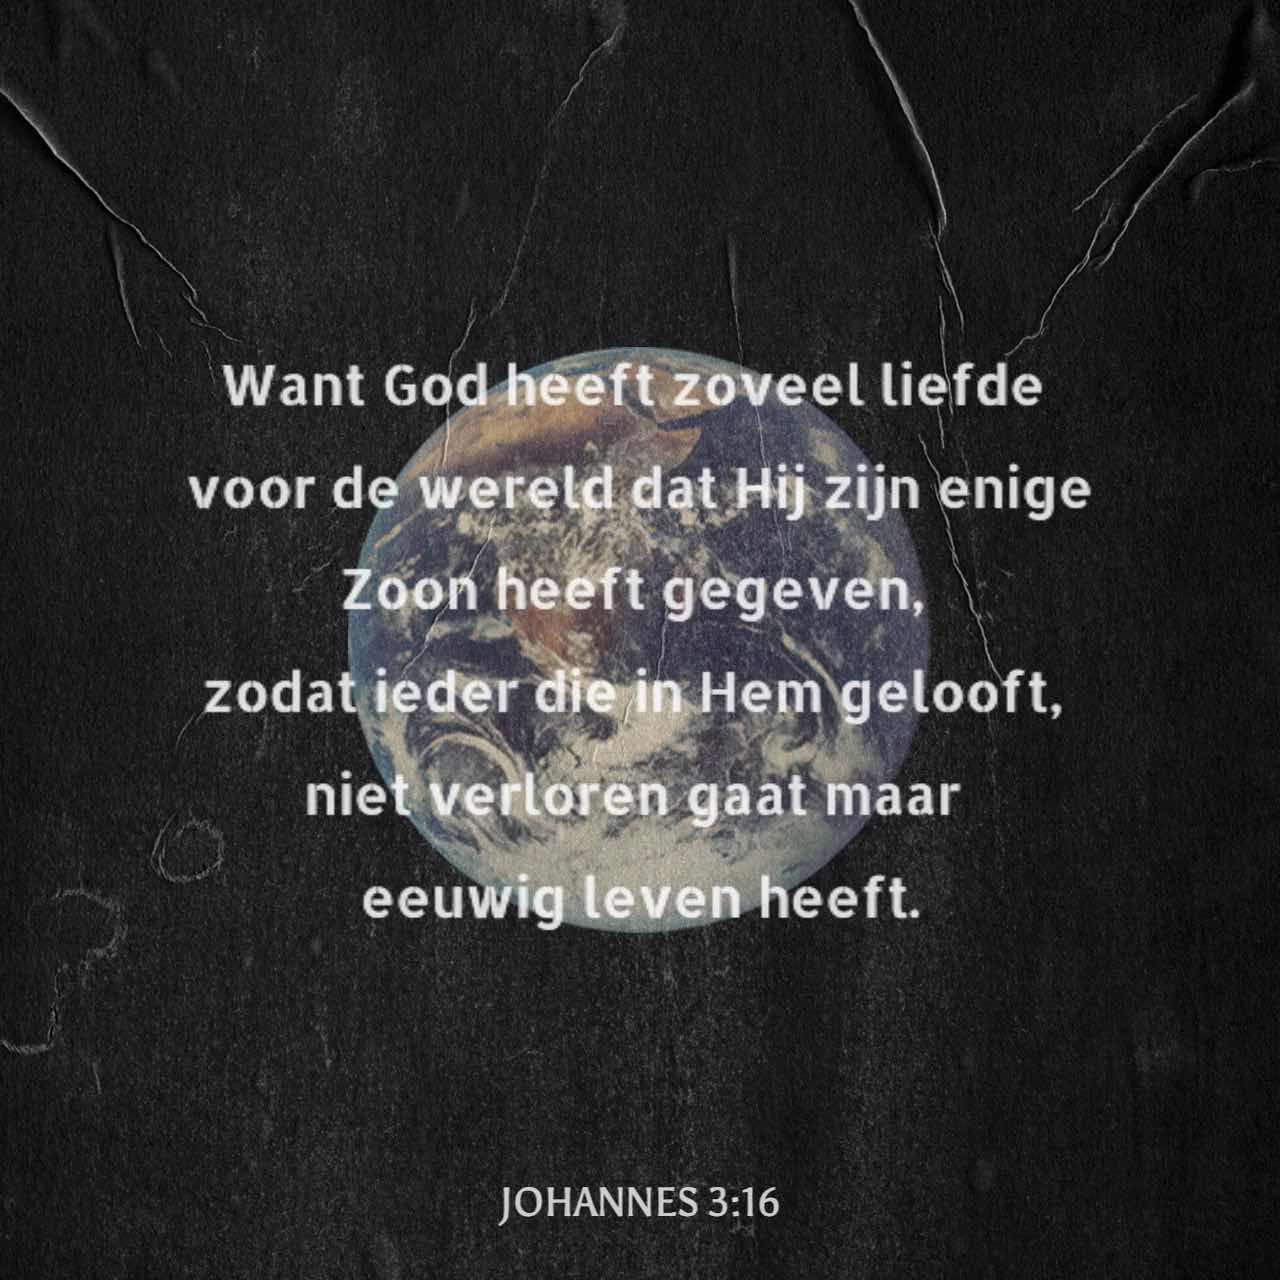 Johannes 3:16